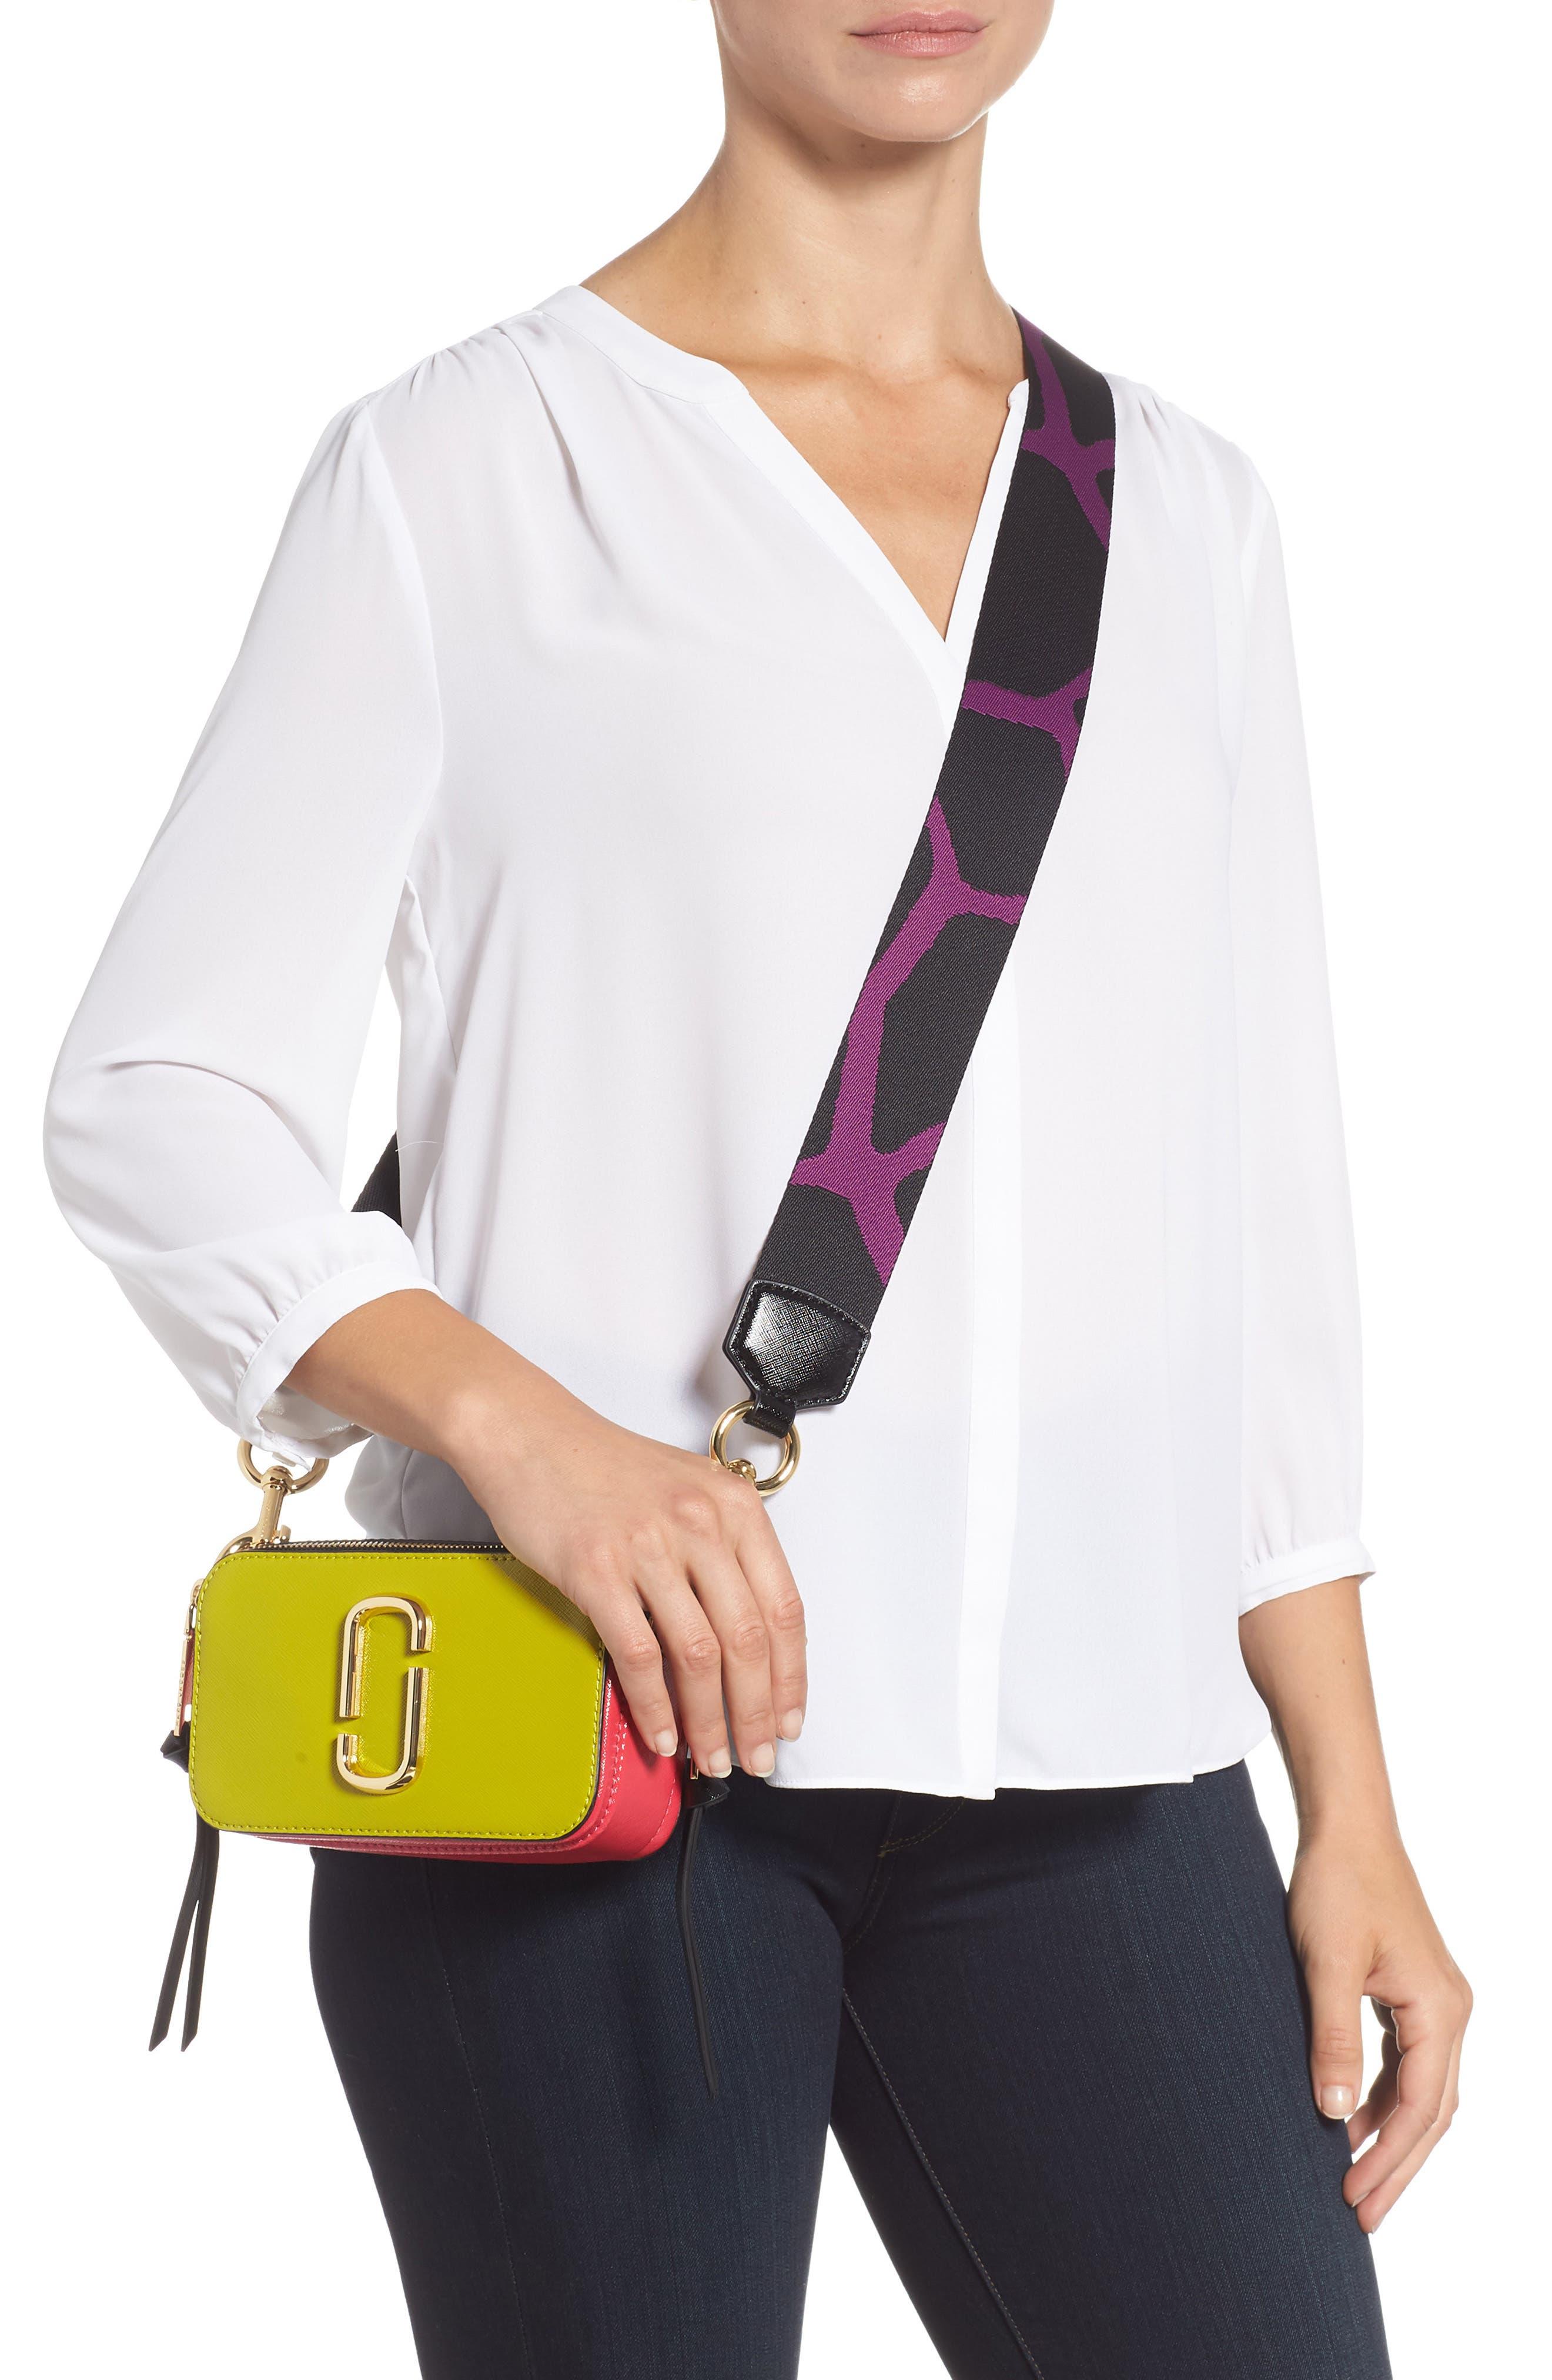 Snapshot Crossbody Bag,                             Alternate thumbnail 2, color,                             Chartreuse Multi